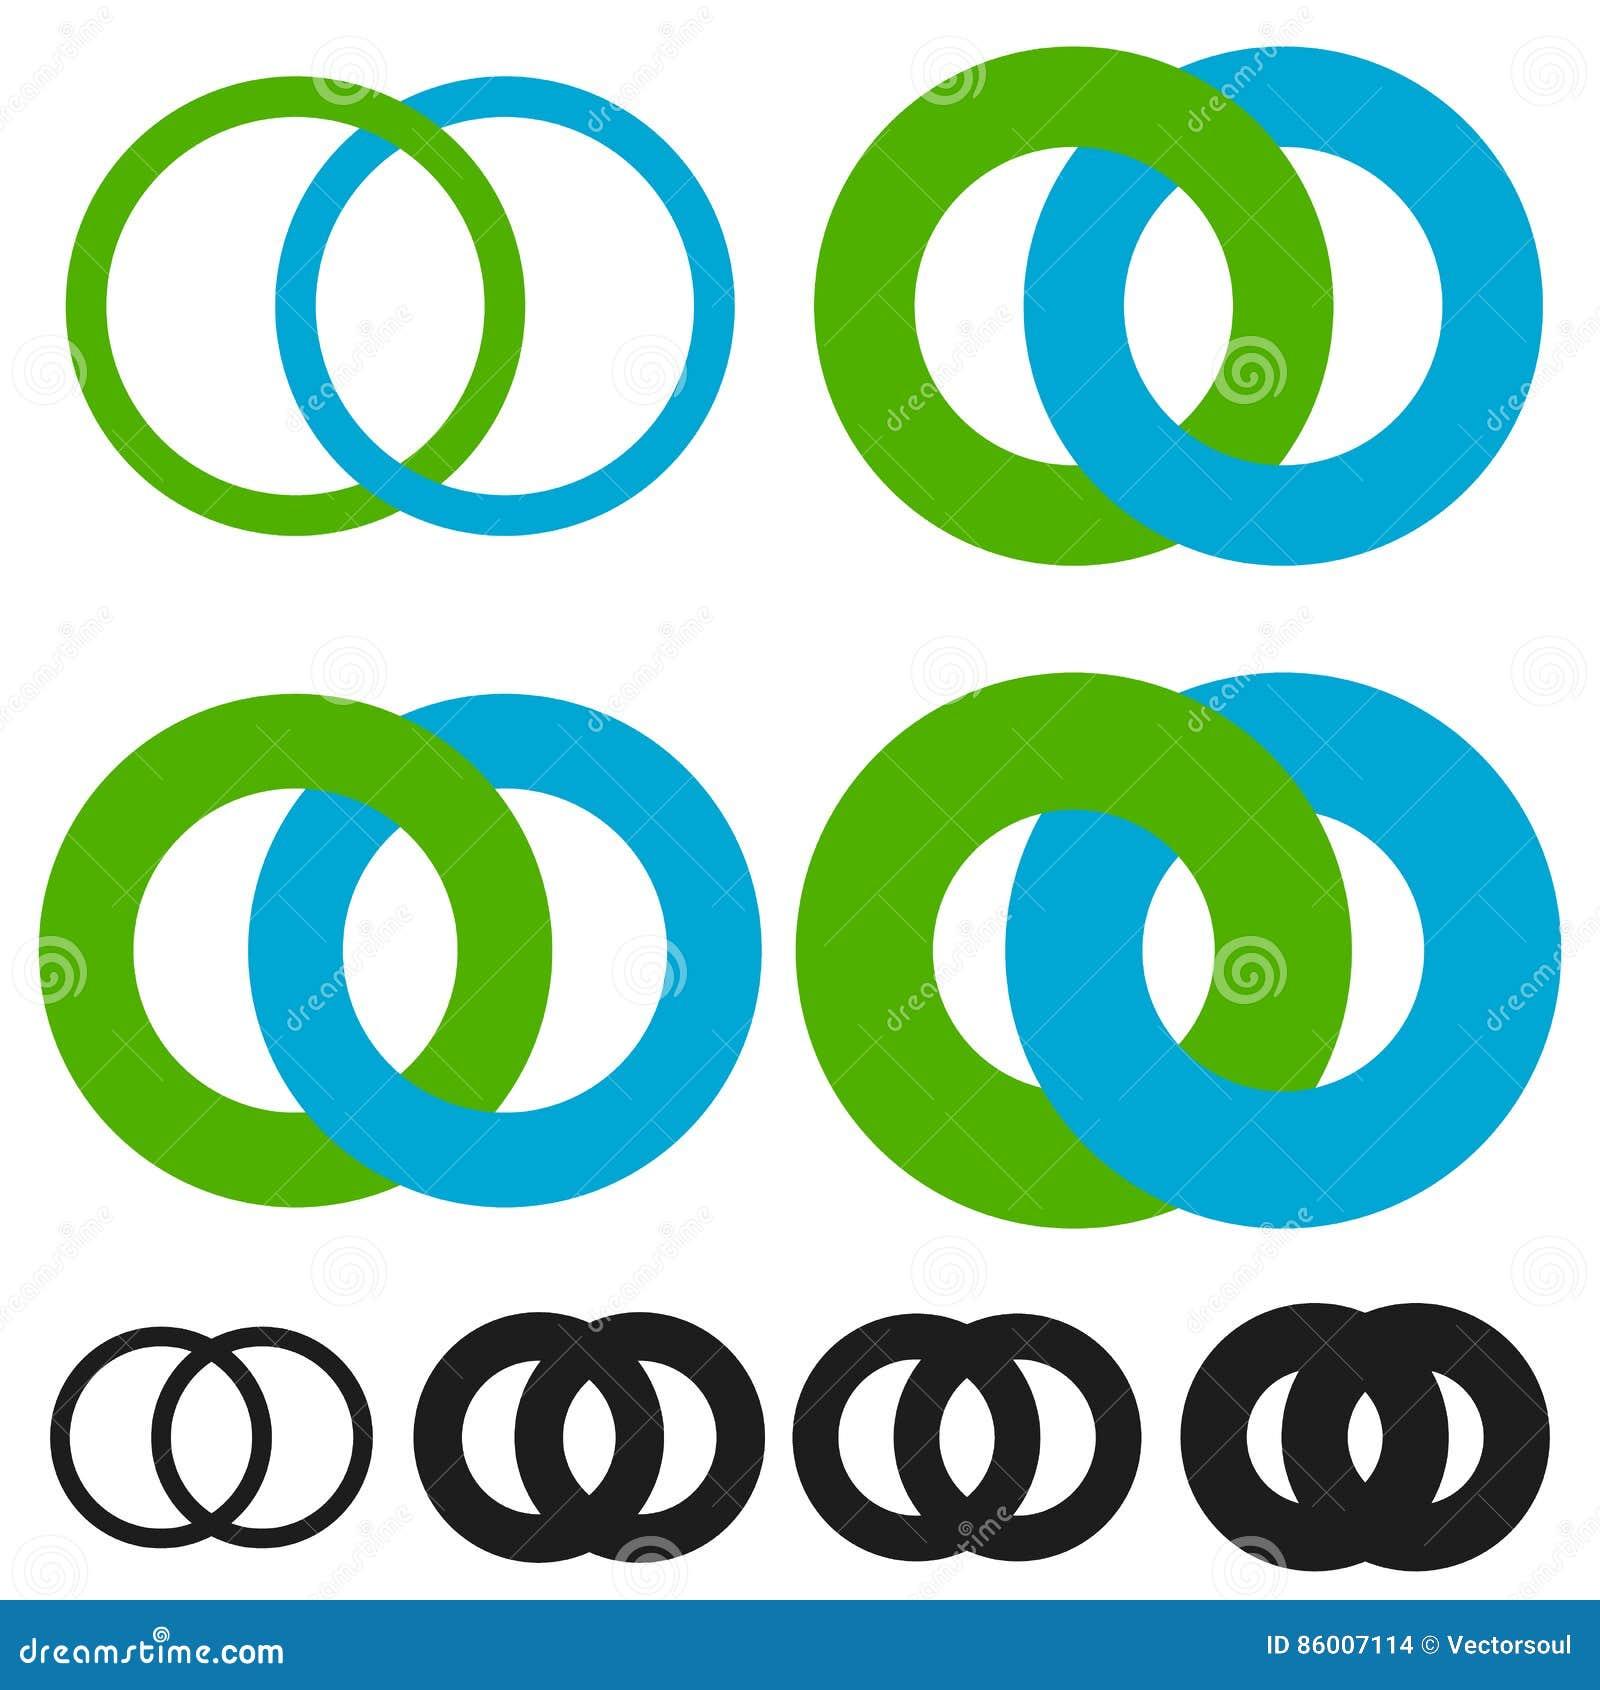 Interlocking circles, rings. Infinite symbol or logo with differ